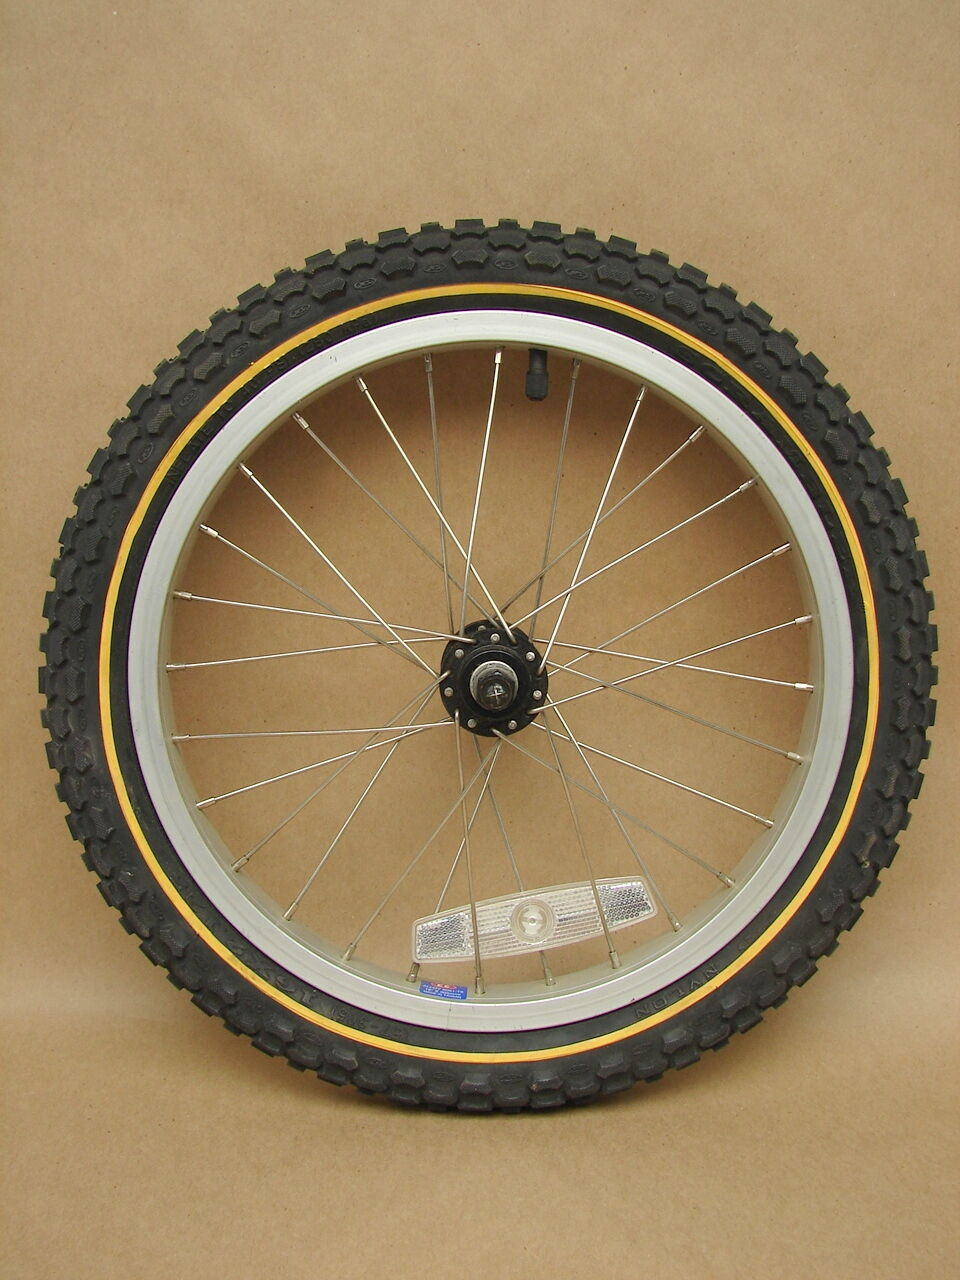 Vtg NOS Burley Bicycle Jogger Replacement Wheel Alloy Rim Scrambler 16 x 2.125